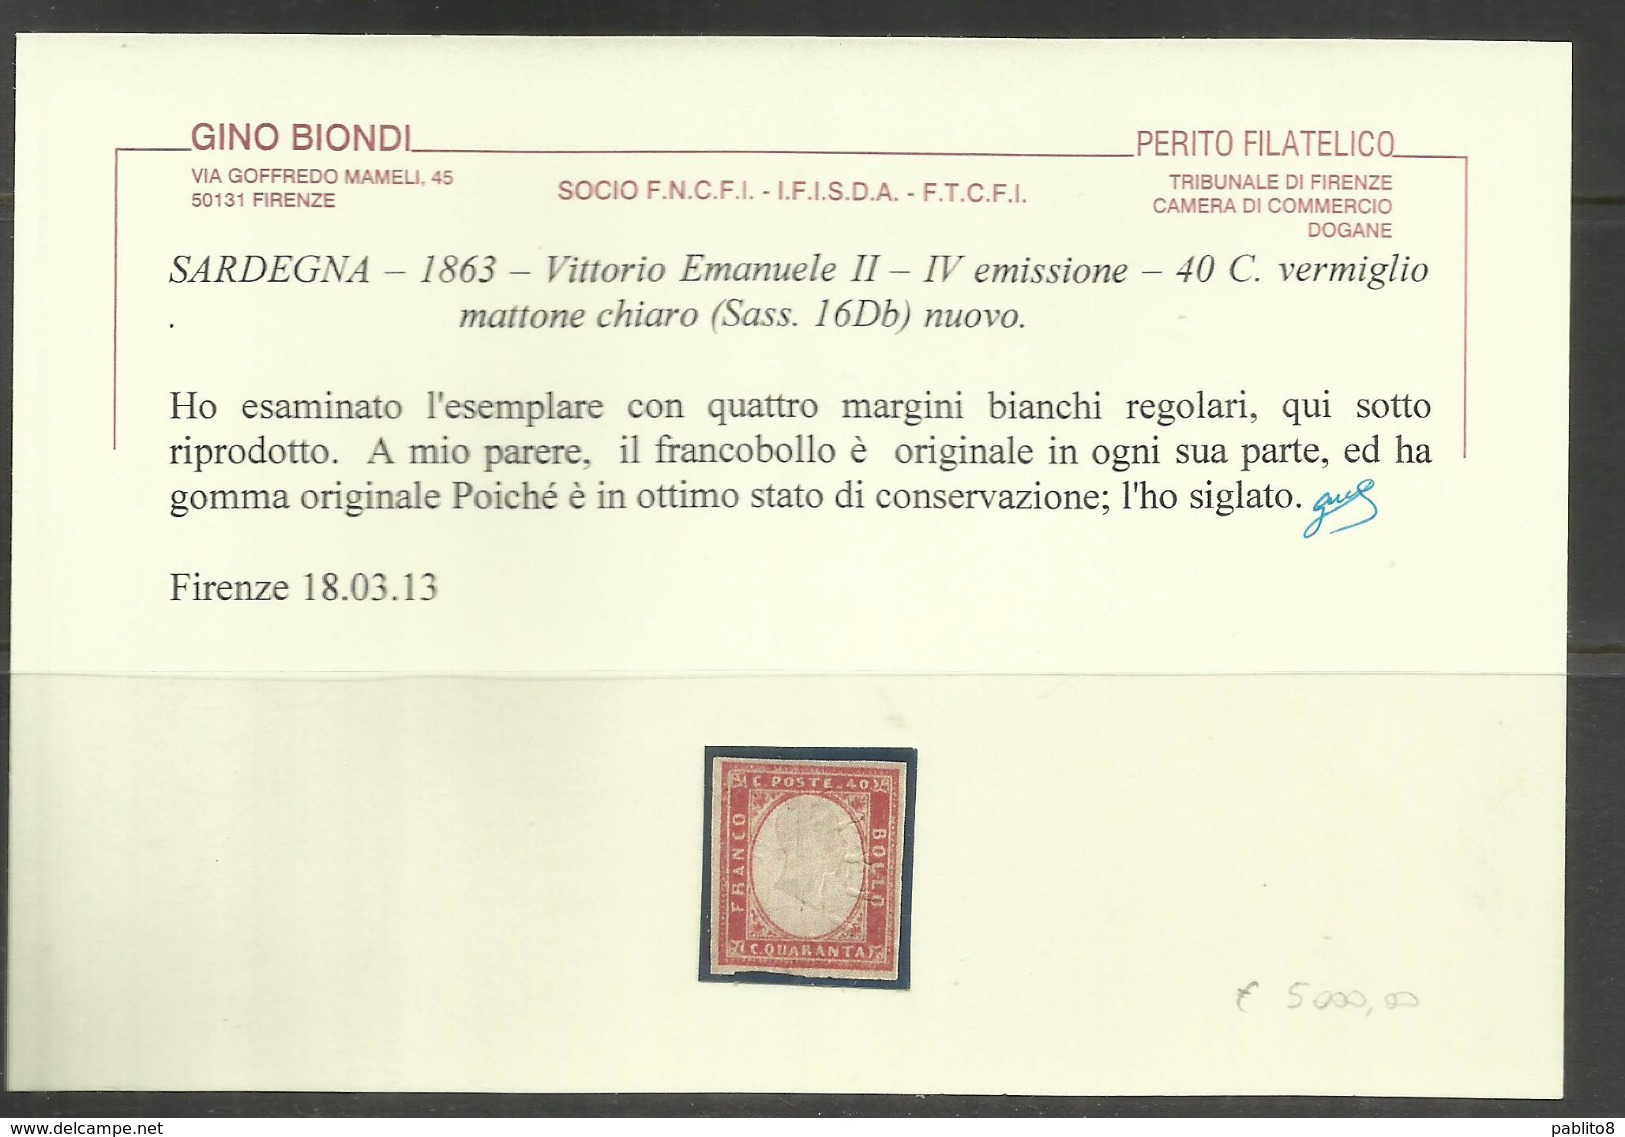 ANTICHI STATI SARDEGNA 1861 VITTORIO EMANUELE IV EMISSIONE CENT 40 40c VERMIGLIO MATTONE CHIARO MLH - Sardegna